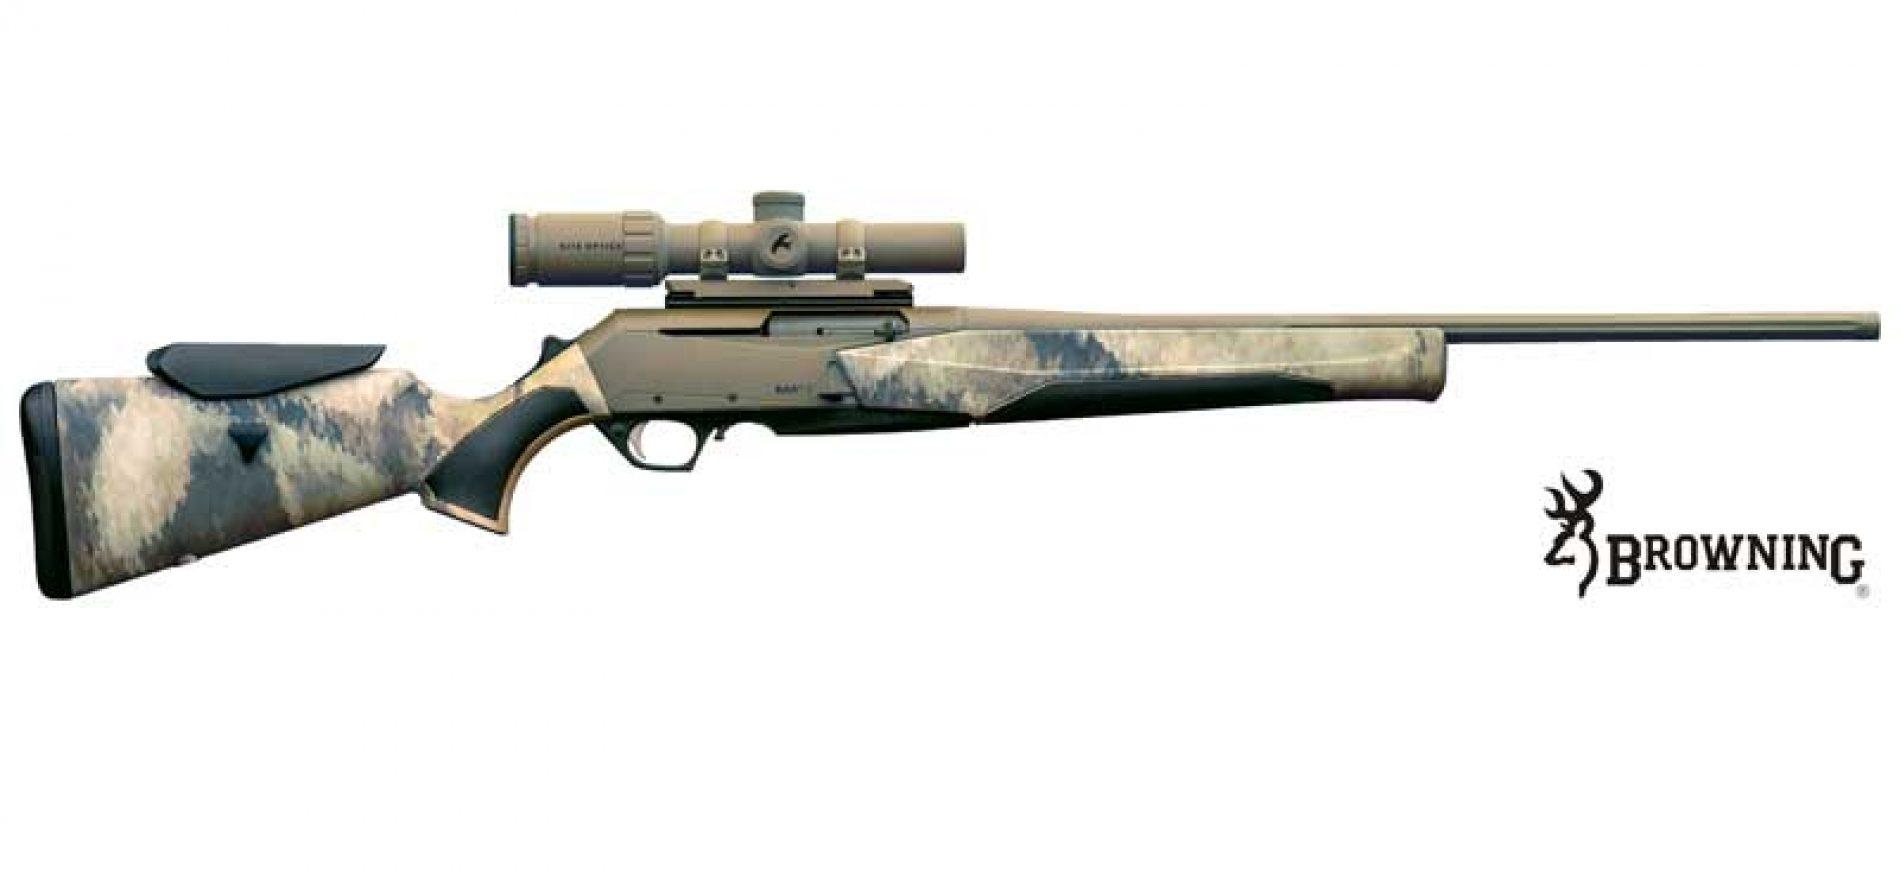 Nuevo rifle semiautomático Bar mk3 Atacs Combo